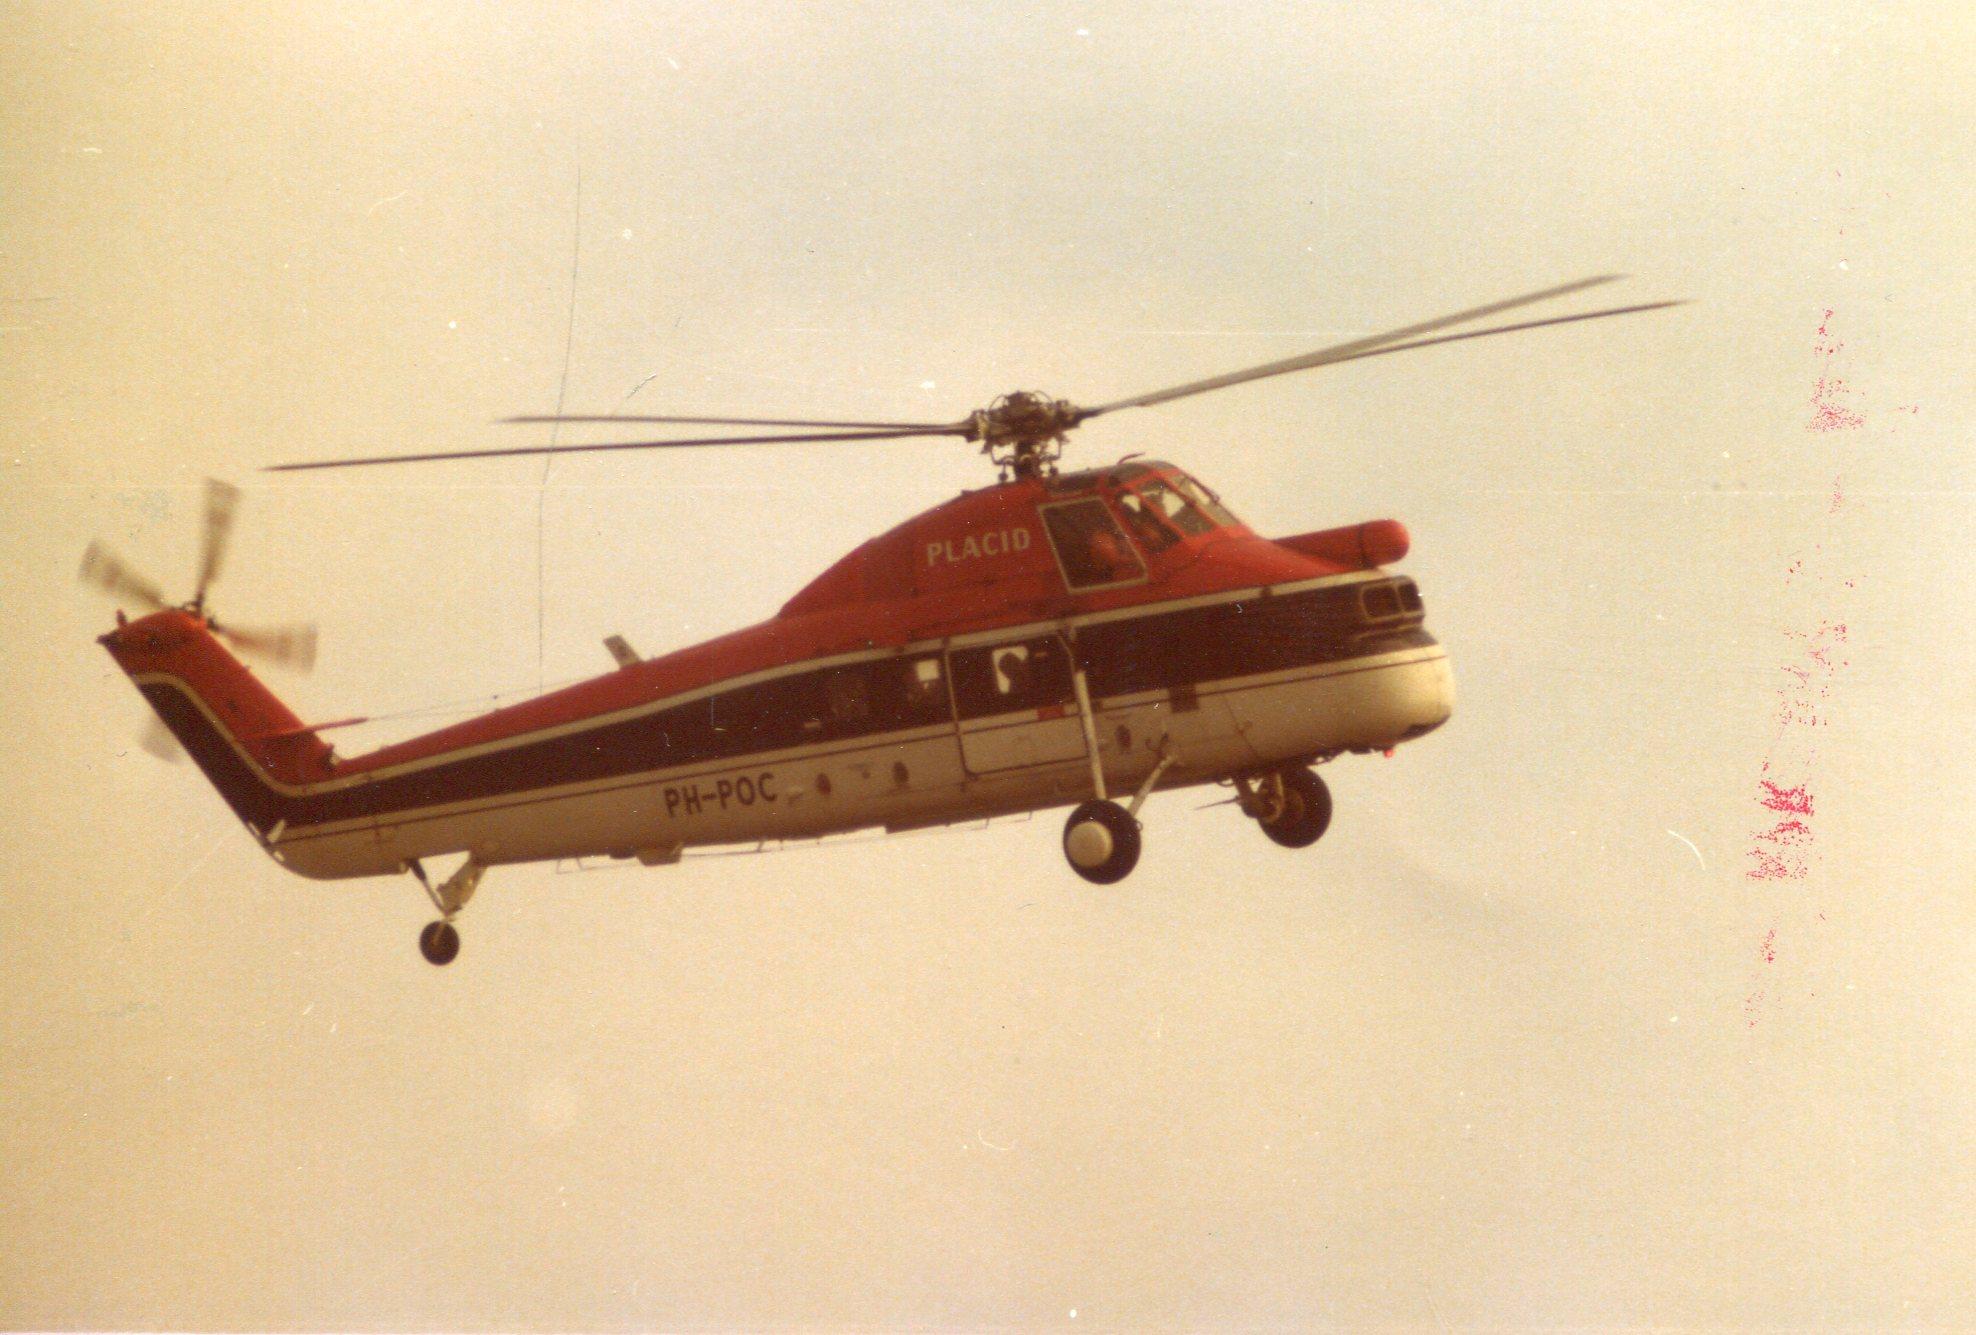 Naam: Den Helder , april 1977 (3).jpg Bekeken: 421 Grootte: 334,4 KB